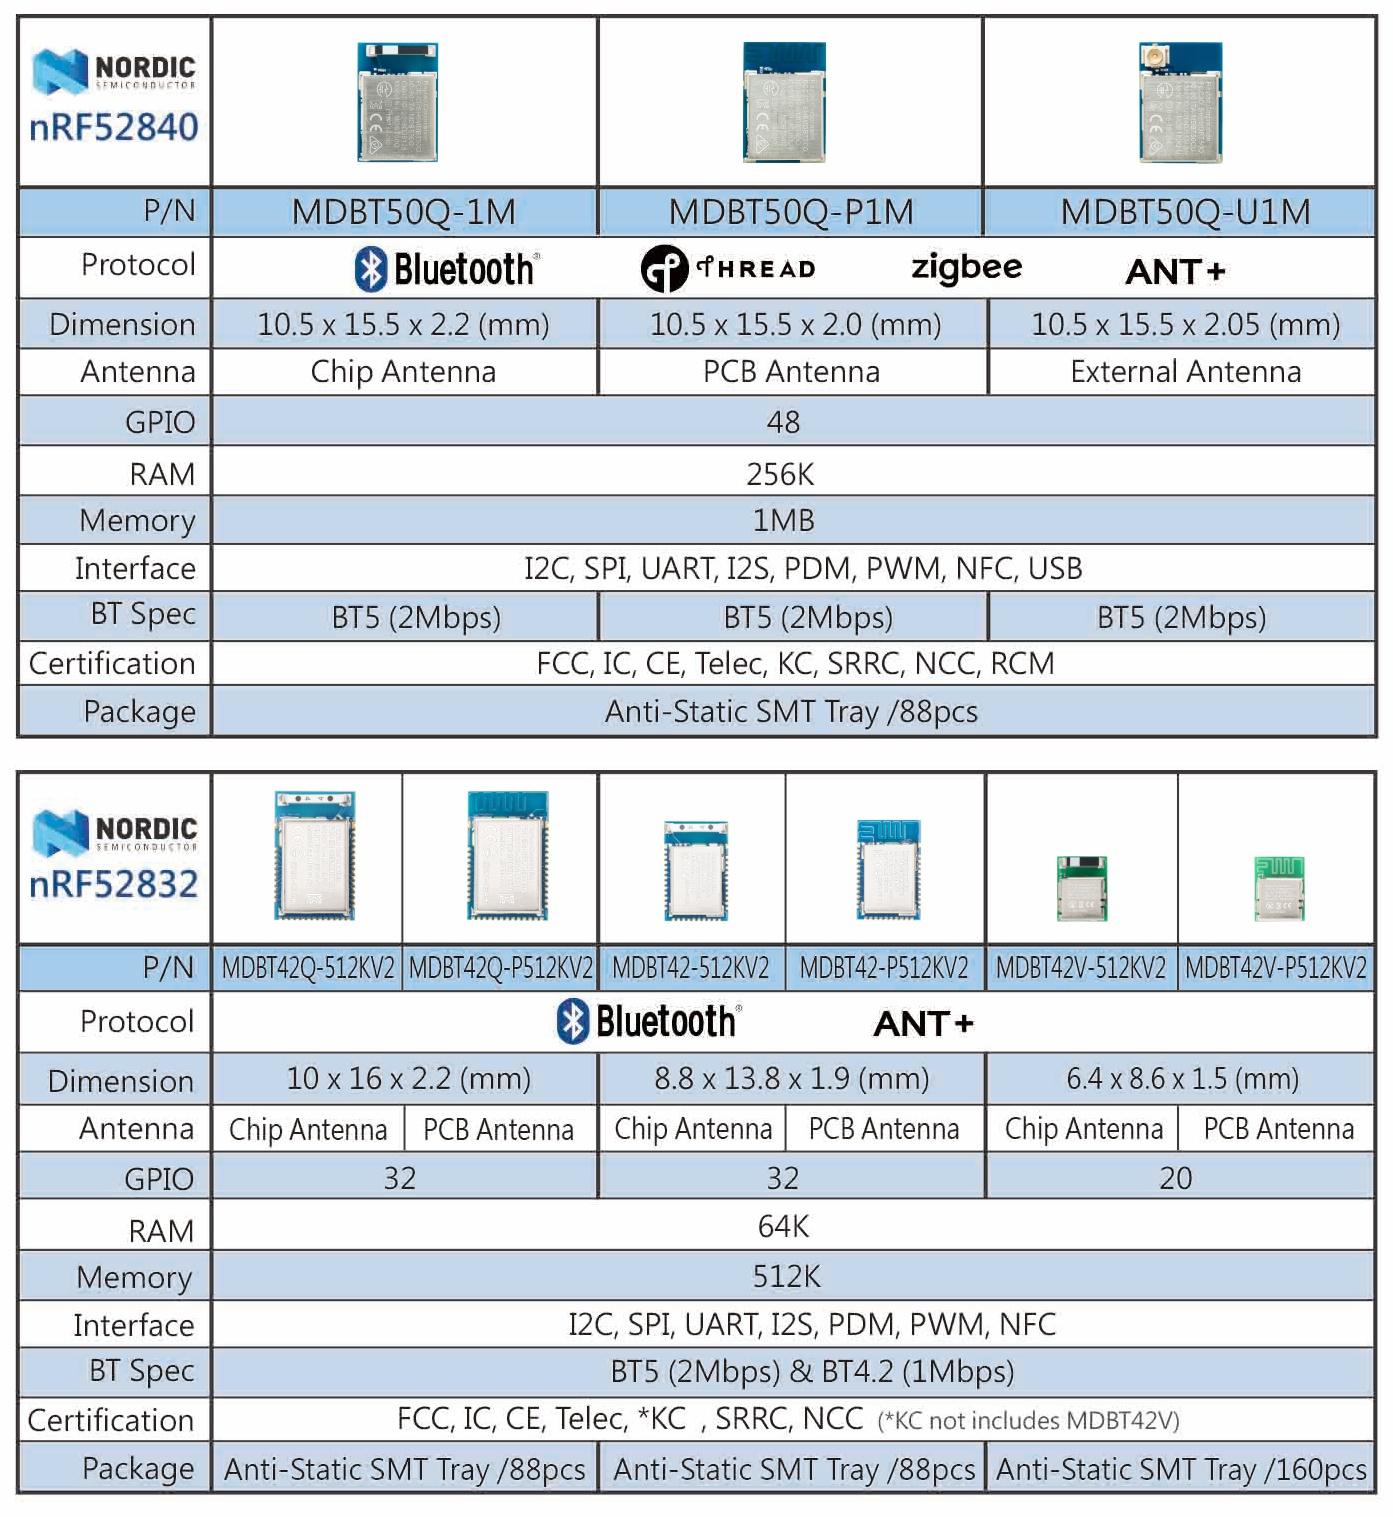 Raytac, Nordic, nRF51, nRF52, Bluetooth, BT4 0, BT4 1, BT4 2